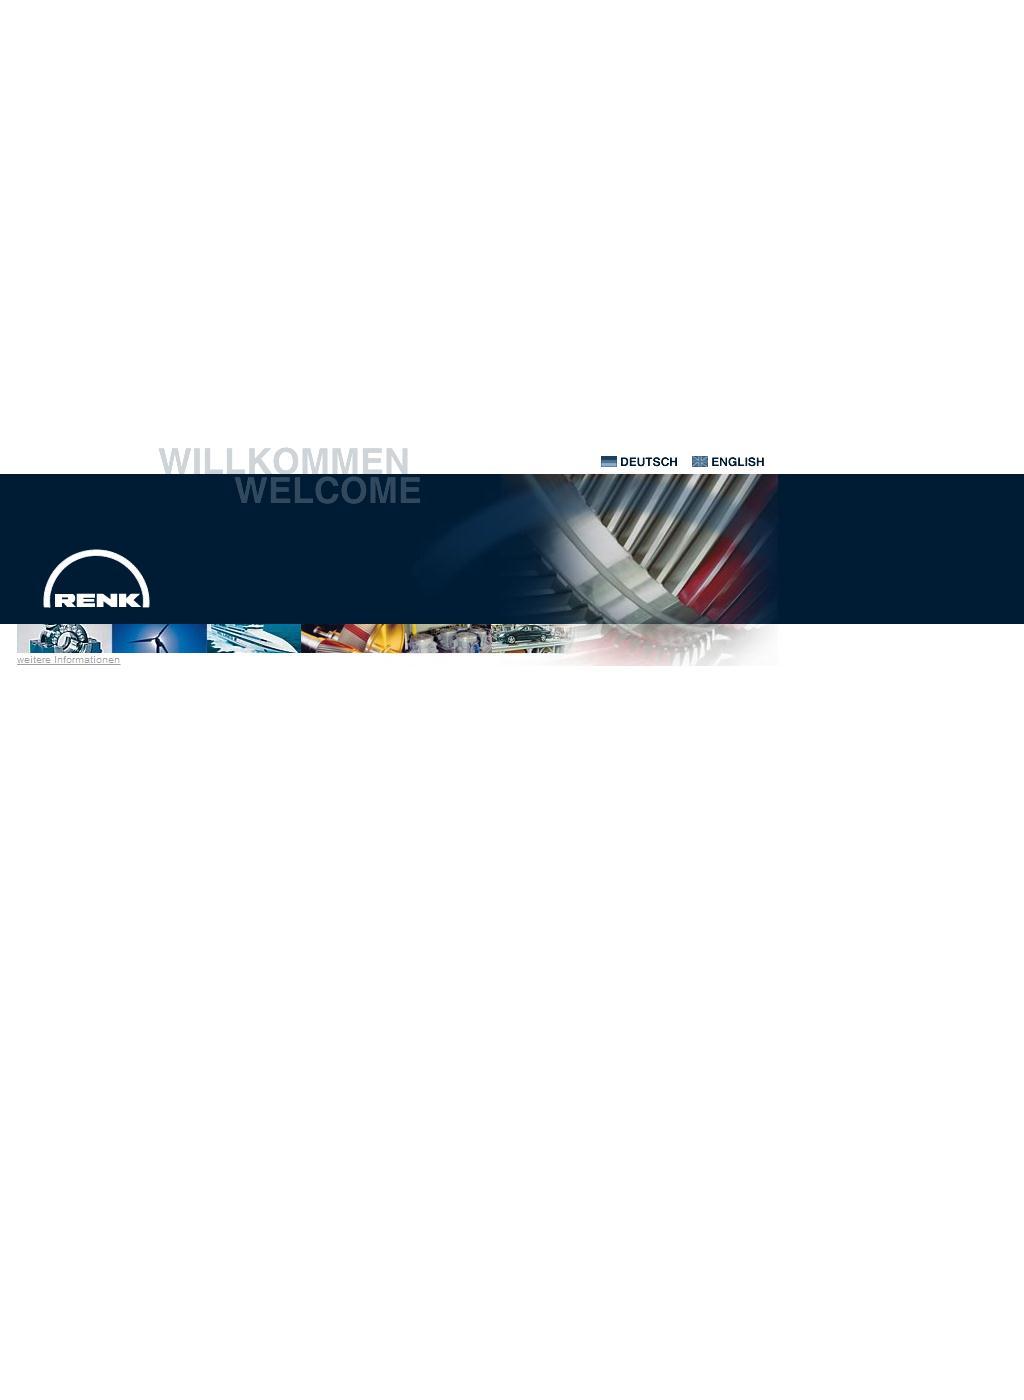 Planetengetriebe, Stirnradgetriebe, Schiffsgetriebe, Industrie Getriebe, Fahrzeuggetriebe, Sondergetriebe